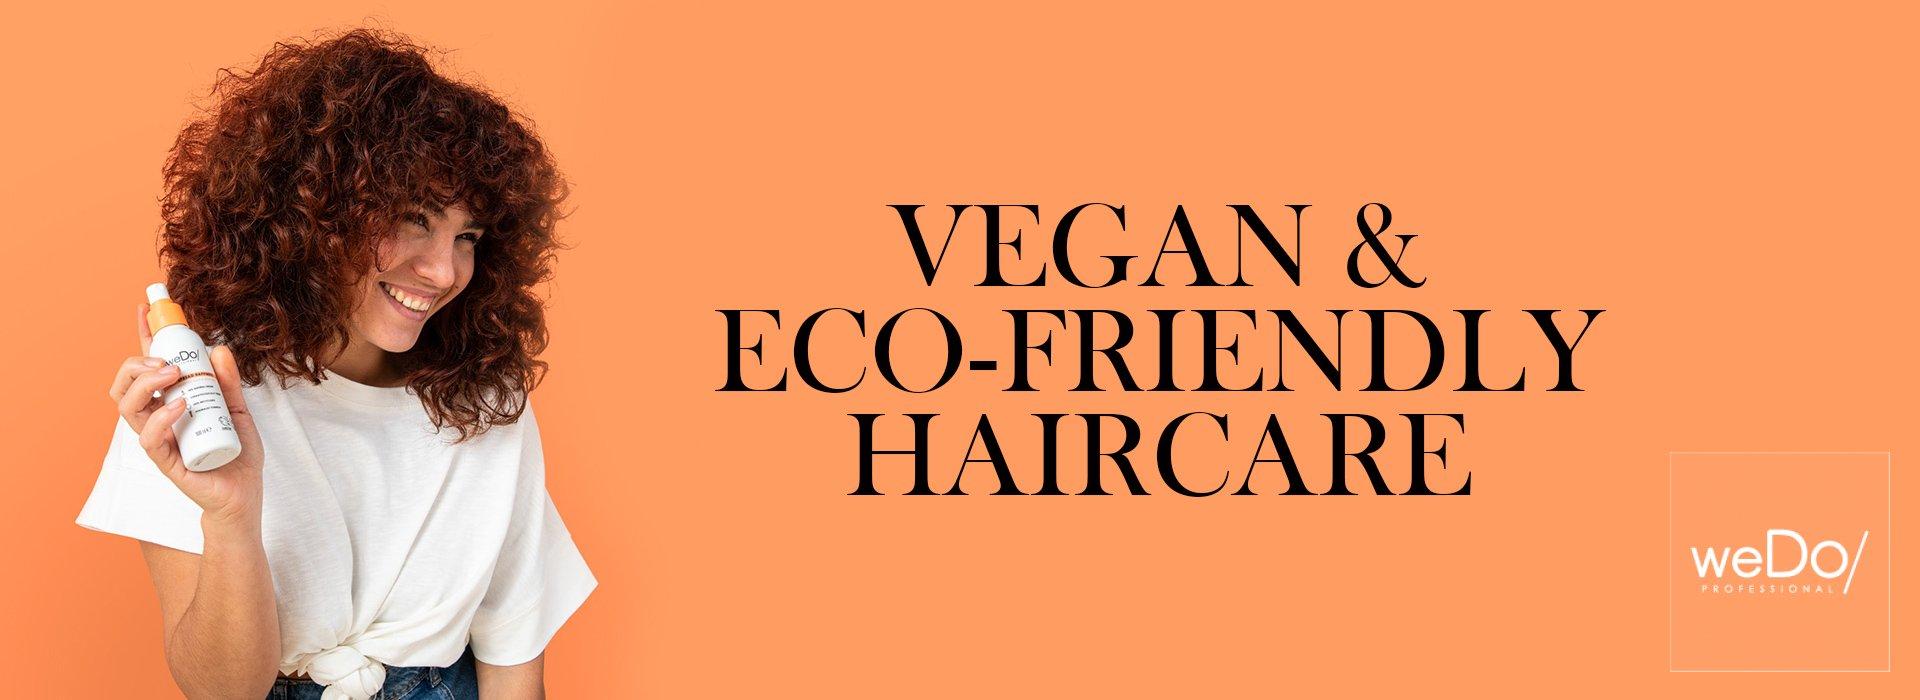 Expert Hair Colour Salon, North Baddlesley, Southampton